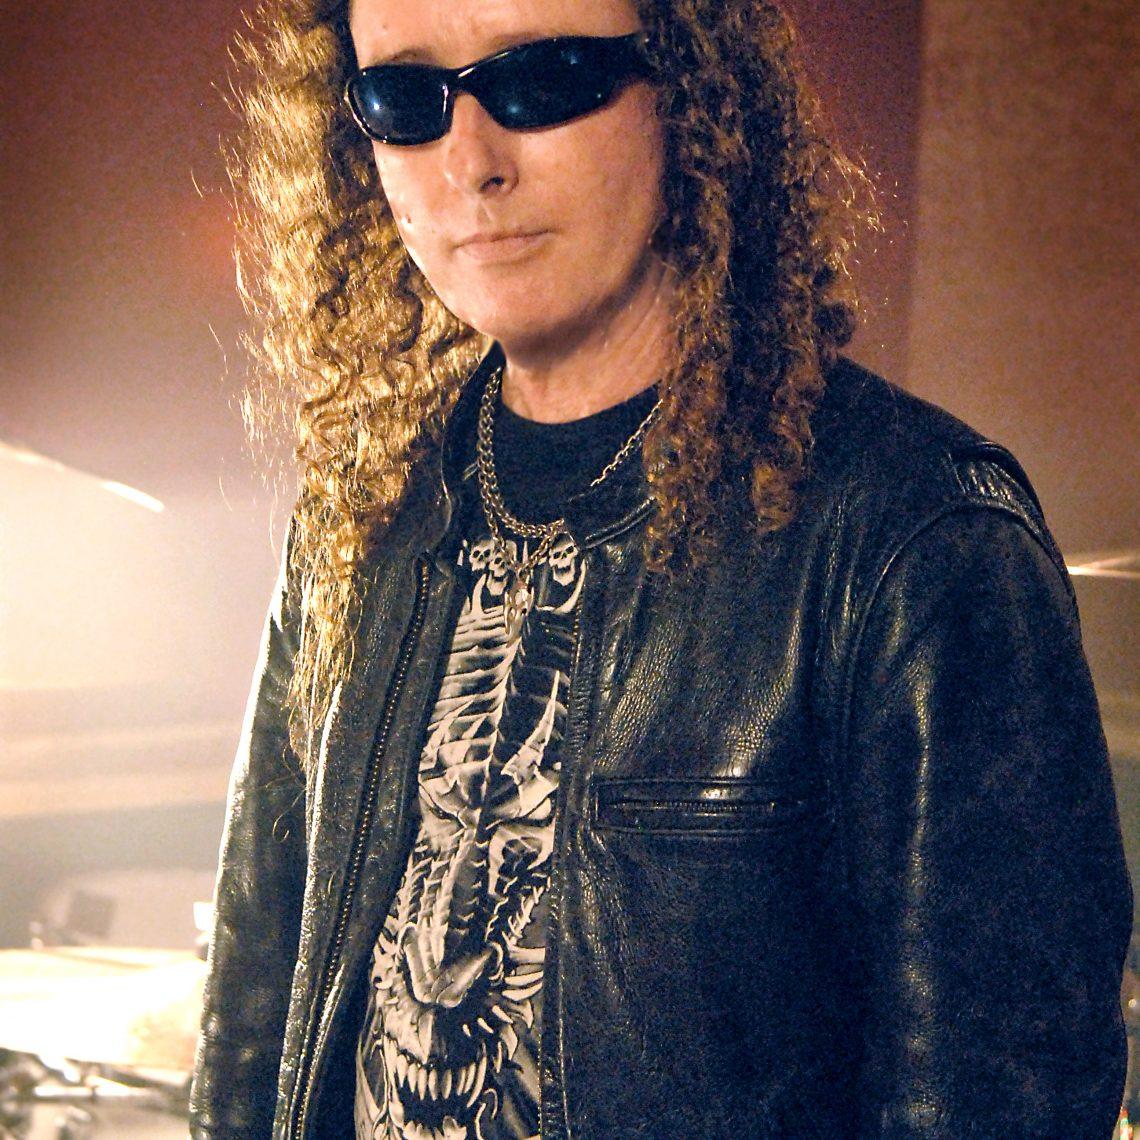 Geoff Thorpe (Vicious Rumors) Interview